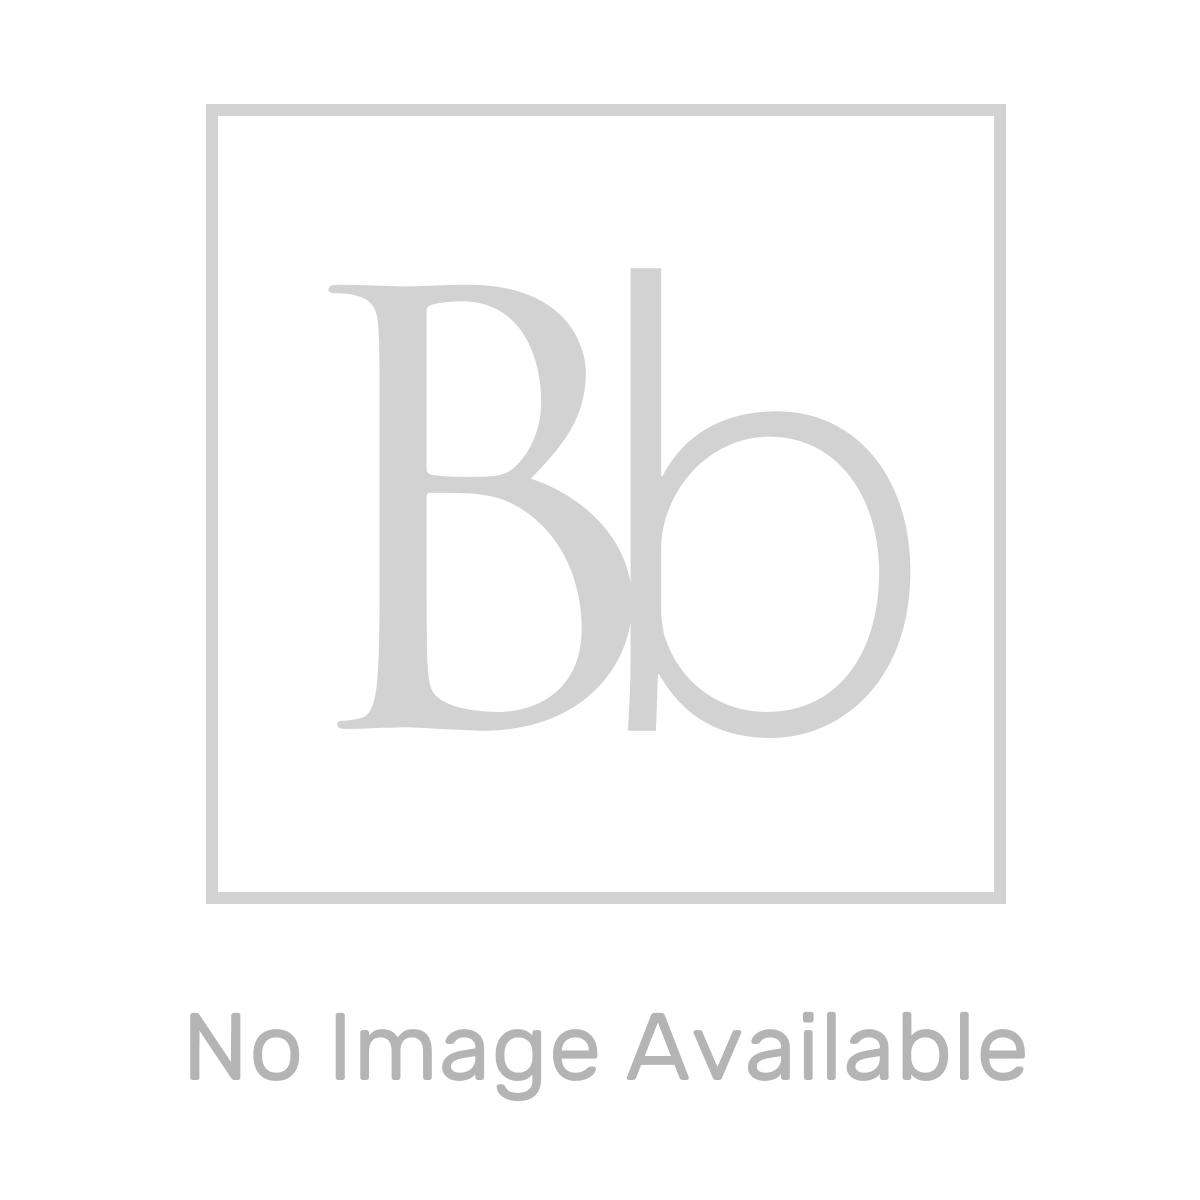 RAK Washington Greige Vanity Unit with Black Countertop 800mm Measurements